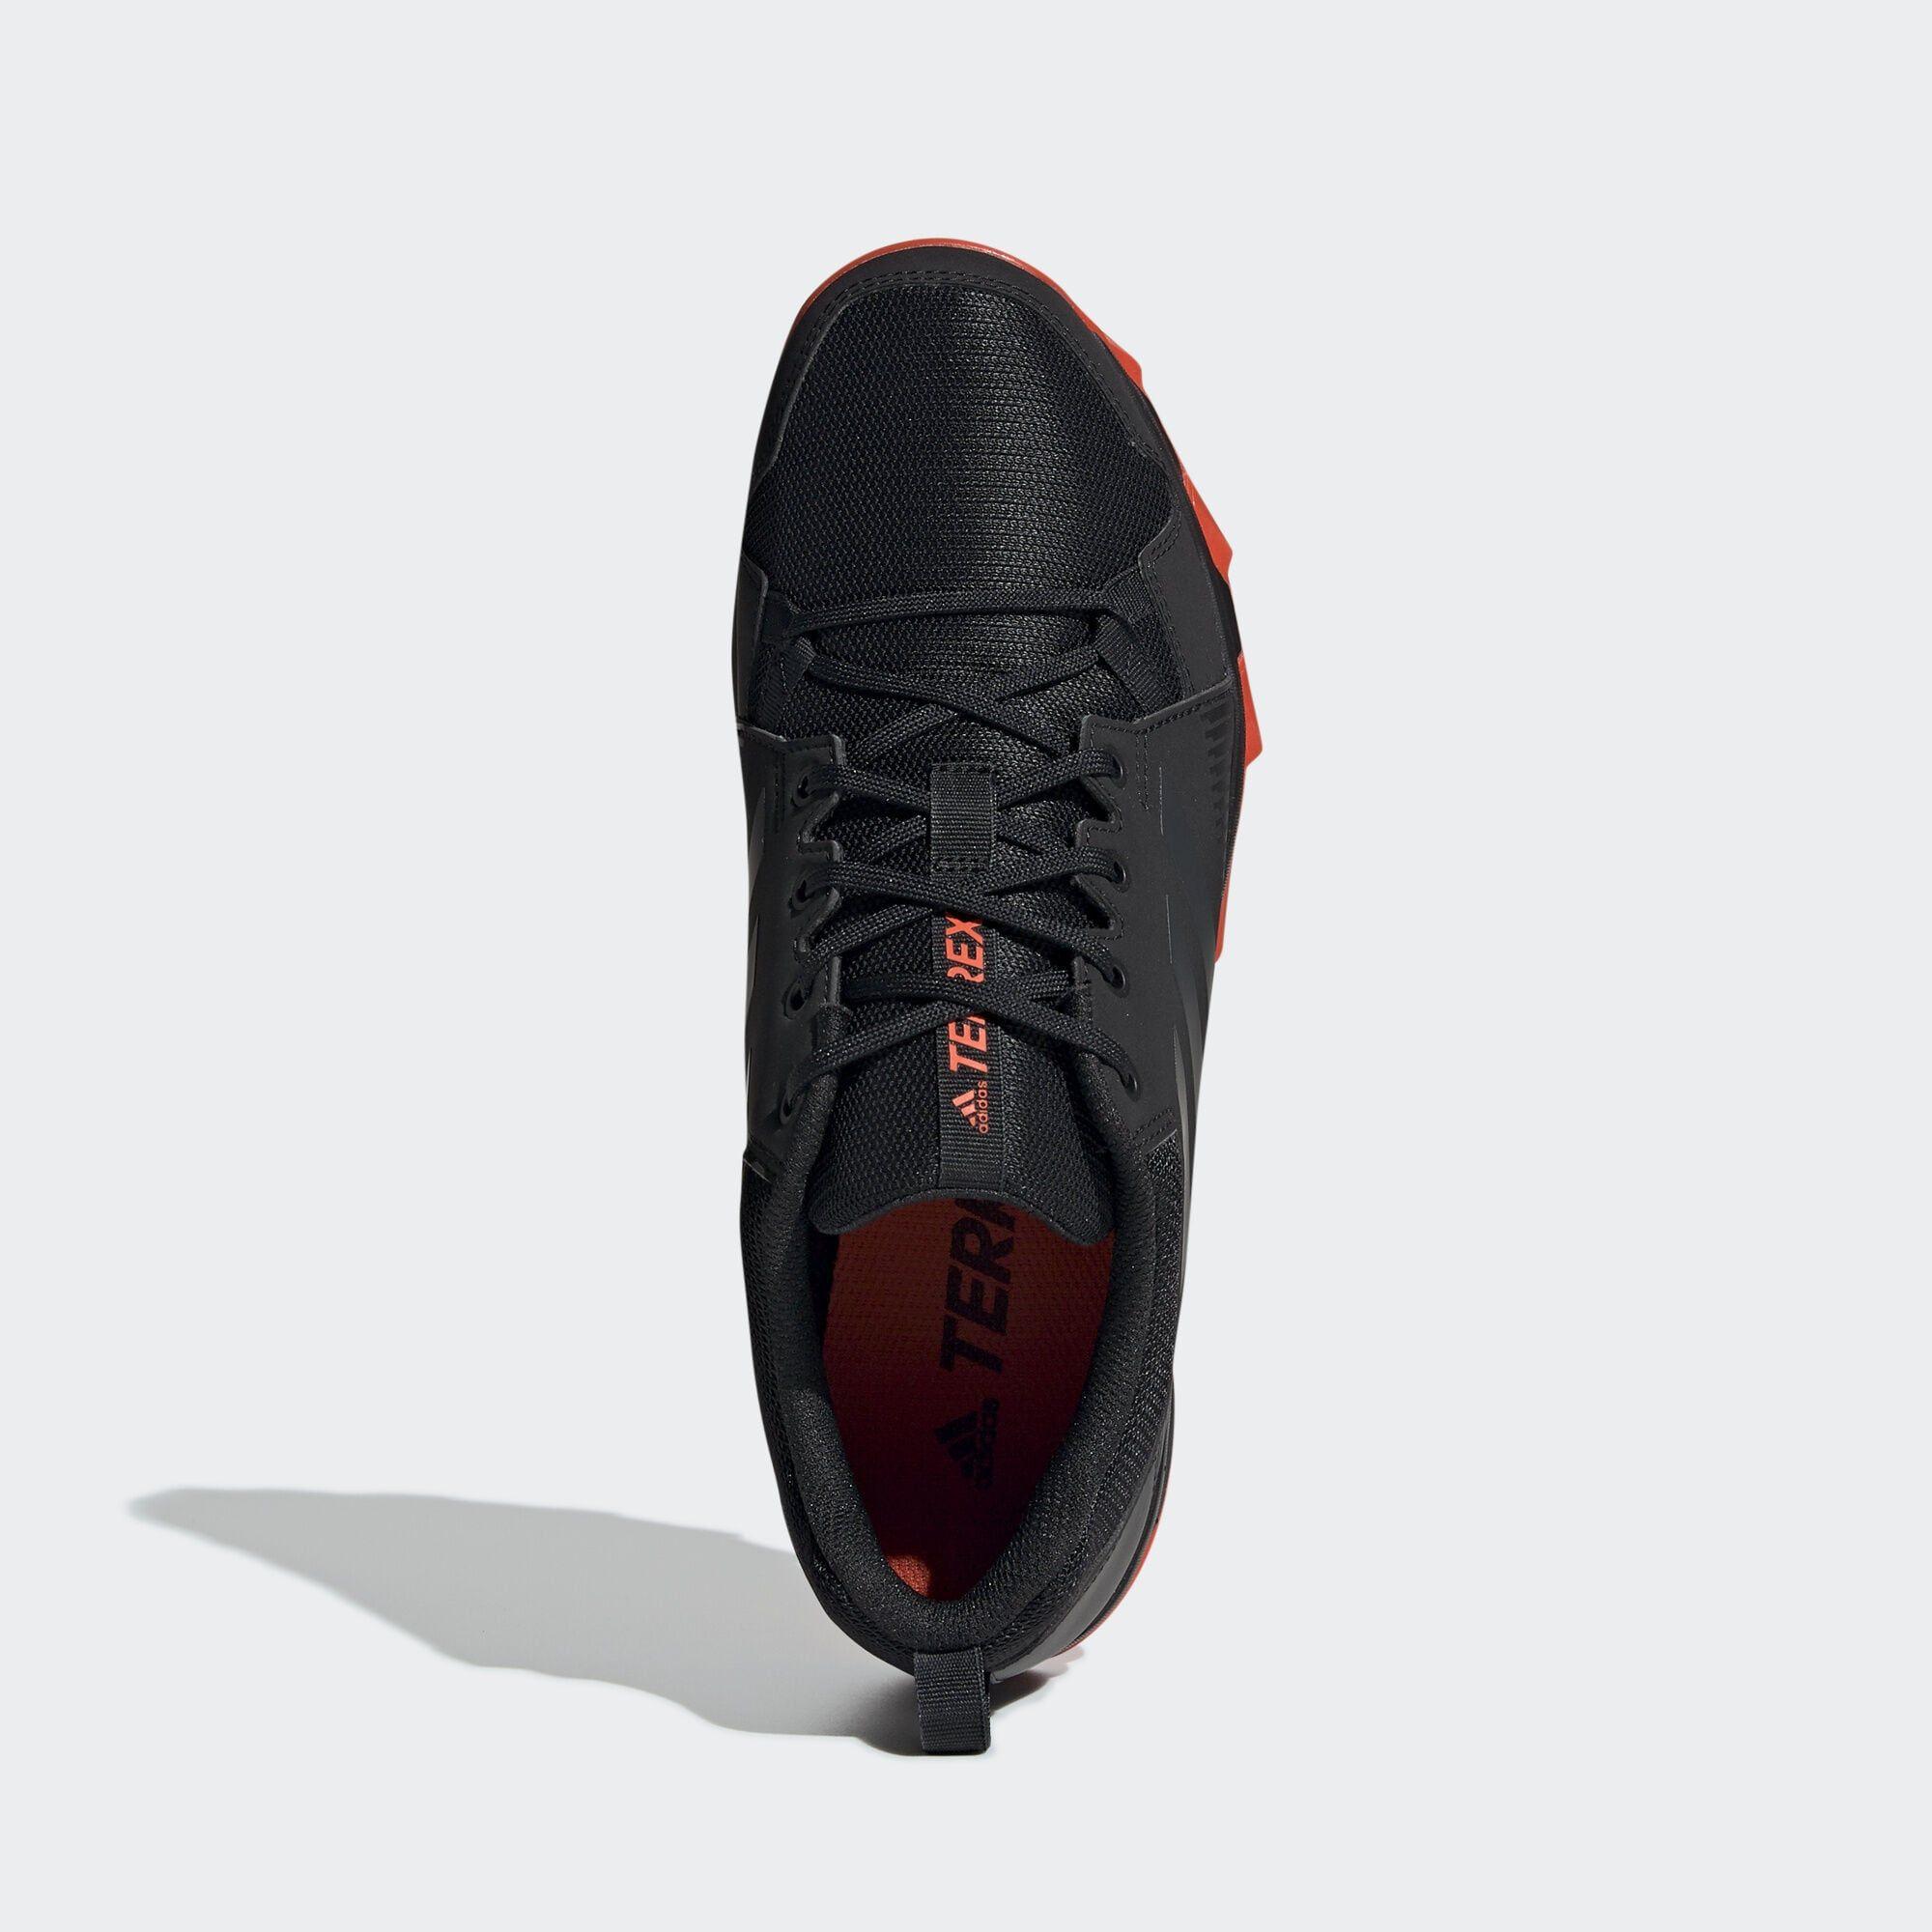 Adidas Performance Schuhe Terrex Tracerocker Herren Orangerot Schwarz Grosse 50 5 51 Mit Bildern Adidas Schuhe Damen Adidas Performance